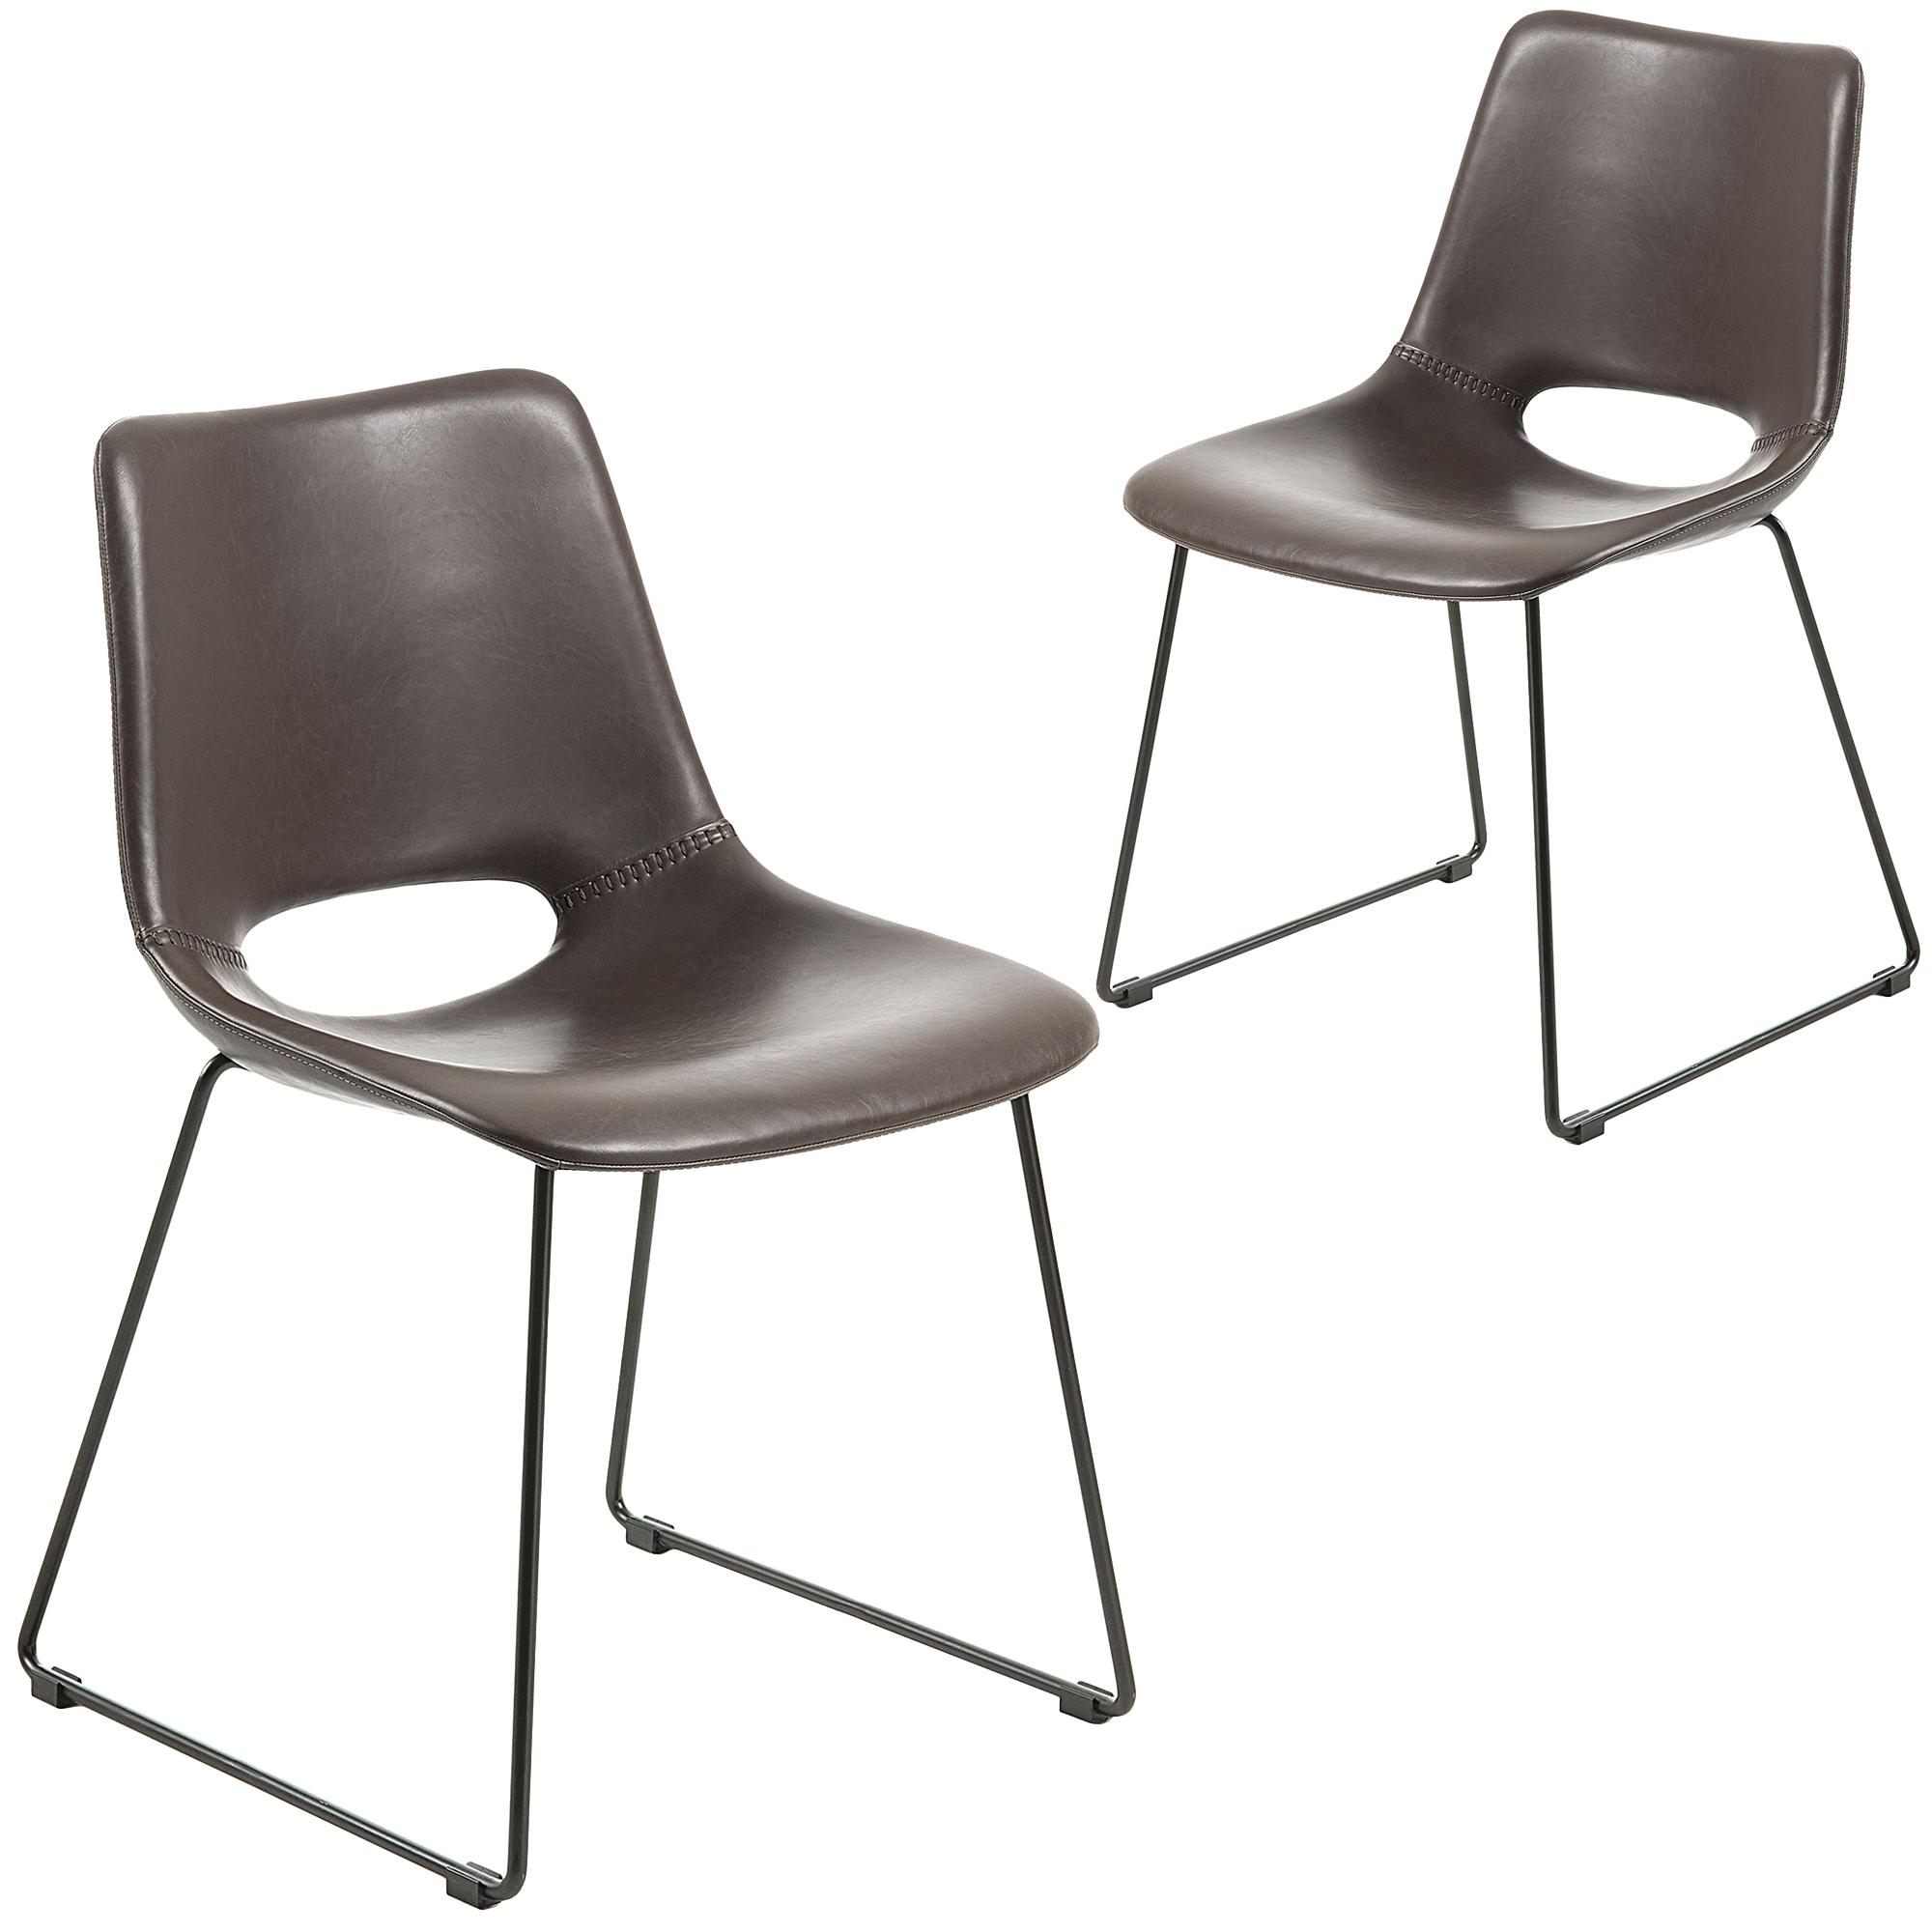 Tremendous Faux Leather Sleigh Dining Chair Set Of 2 Spiritservingveterans Wood Chair Design Ideas Spiritservingveteransorg